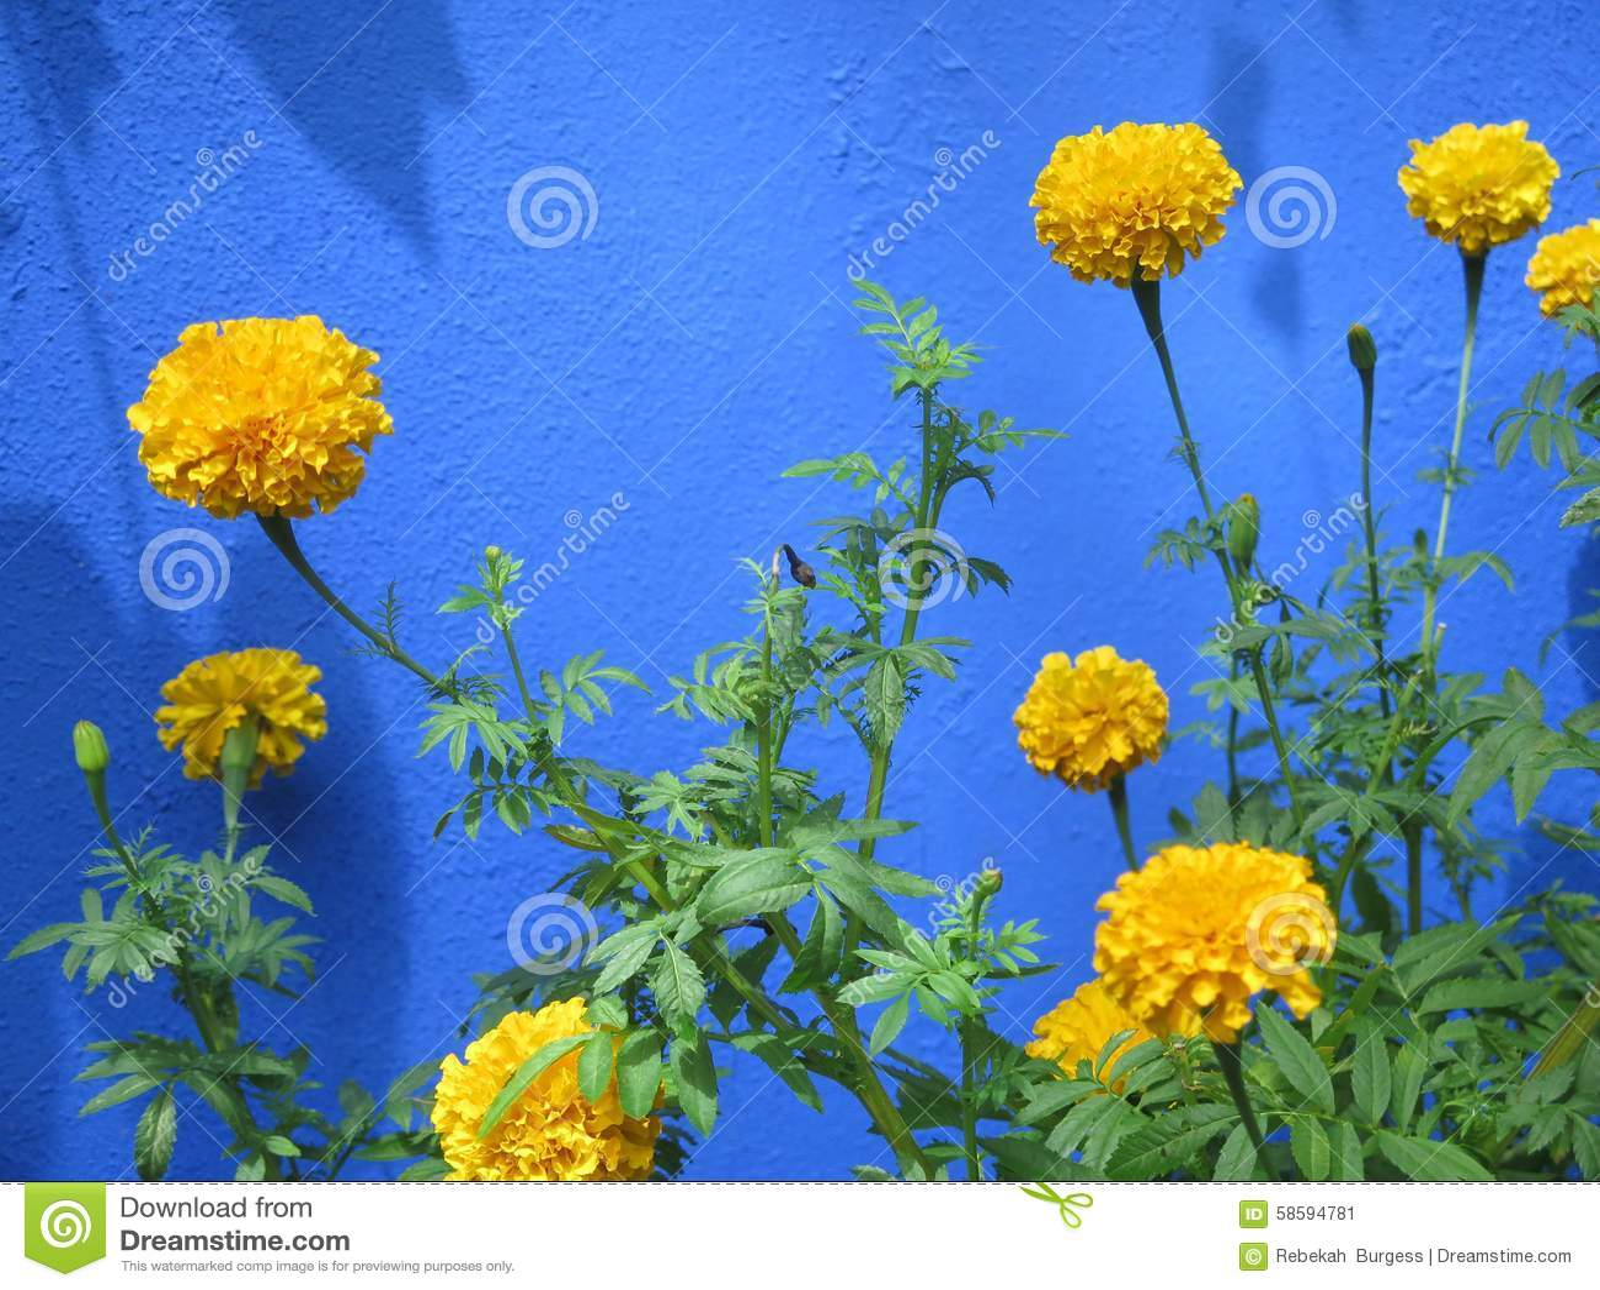 marigolds by elizabeth collier Elizabeth collier - age: 72 years 1 marigold street, worsley hall 407 warrington road, abram grave: 259 sw.